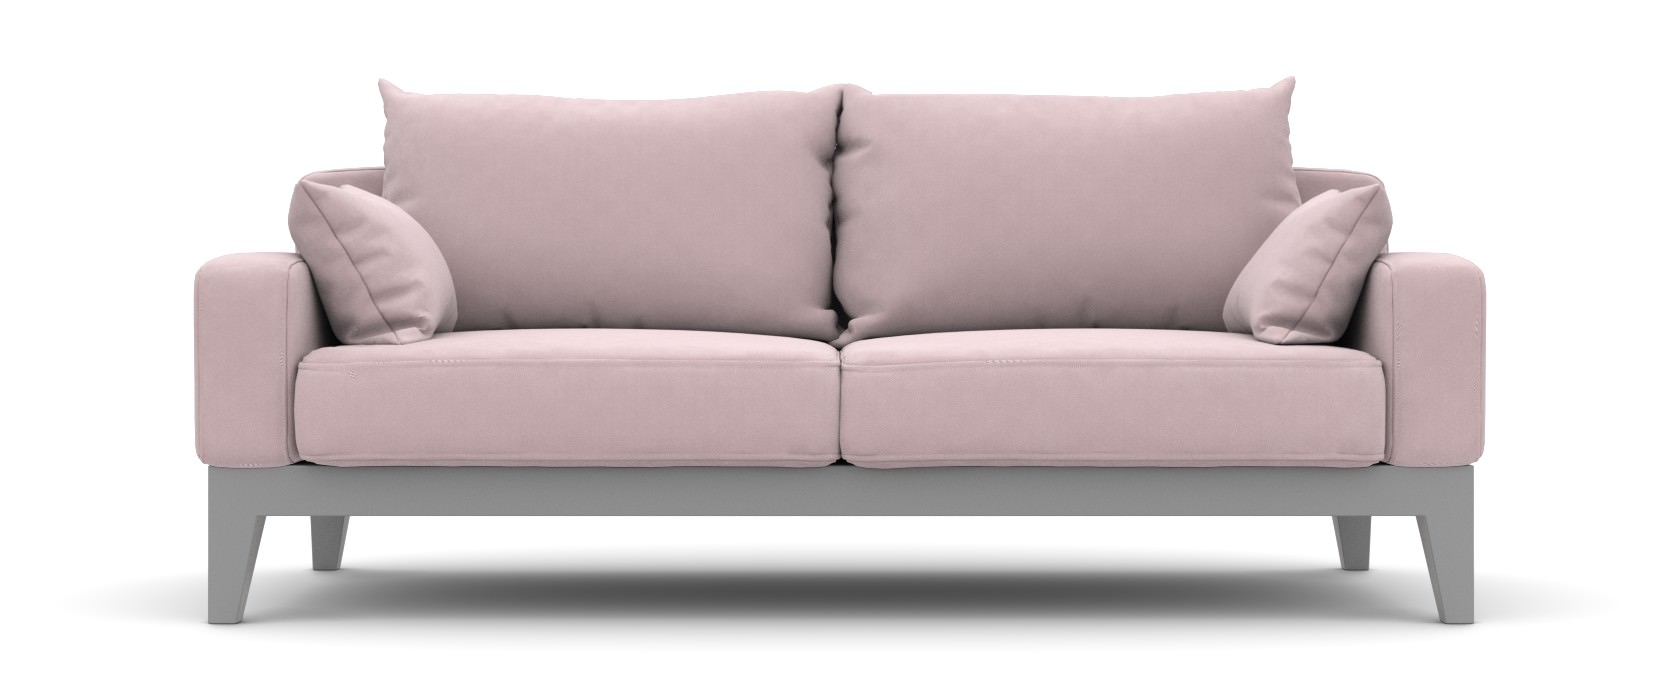 Двухместный диван Antonio - Pufetto